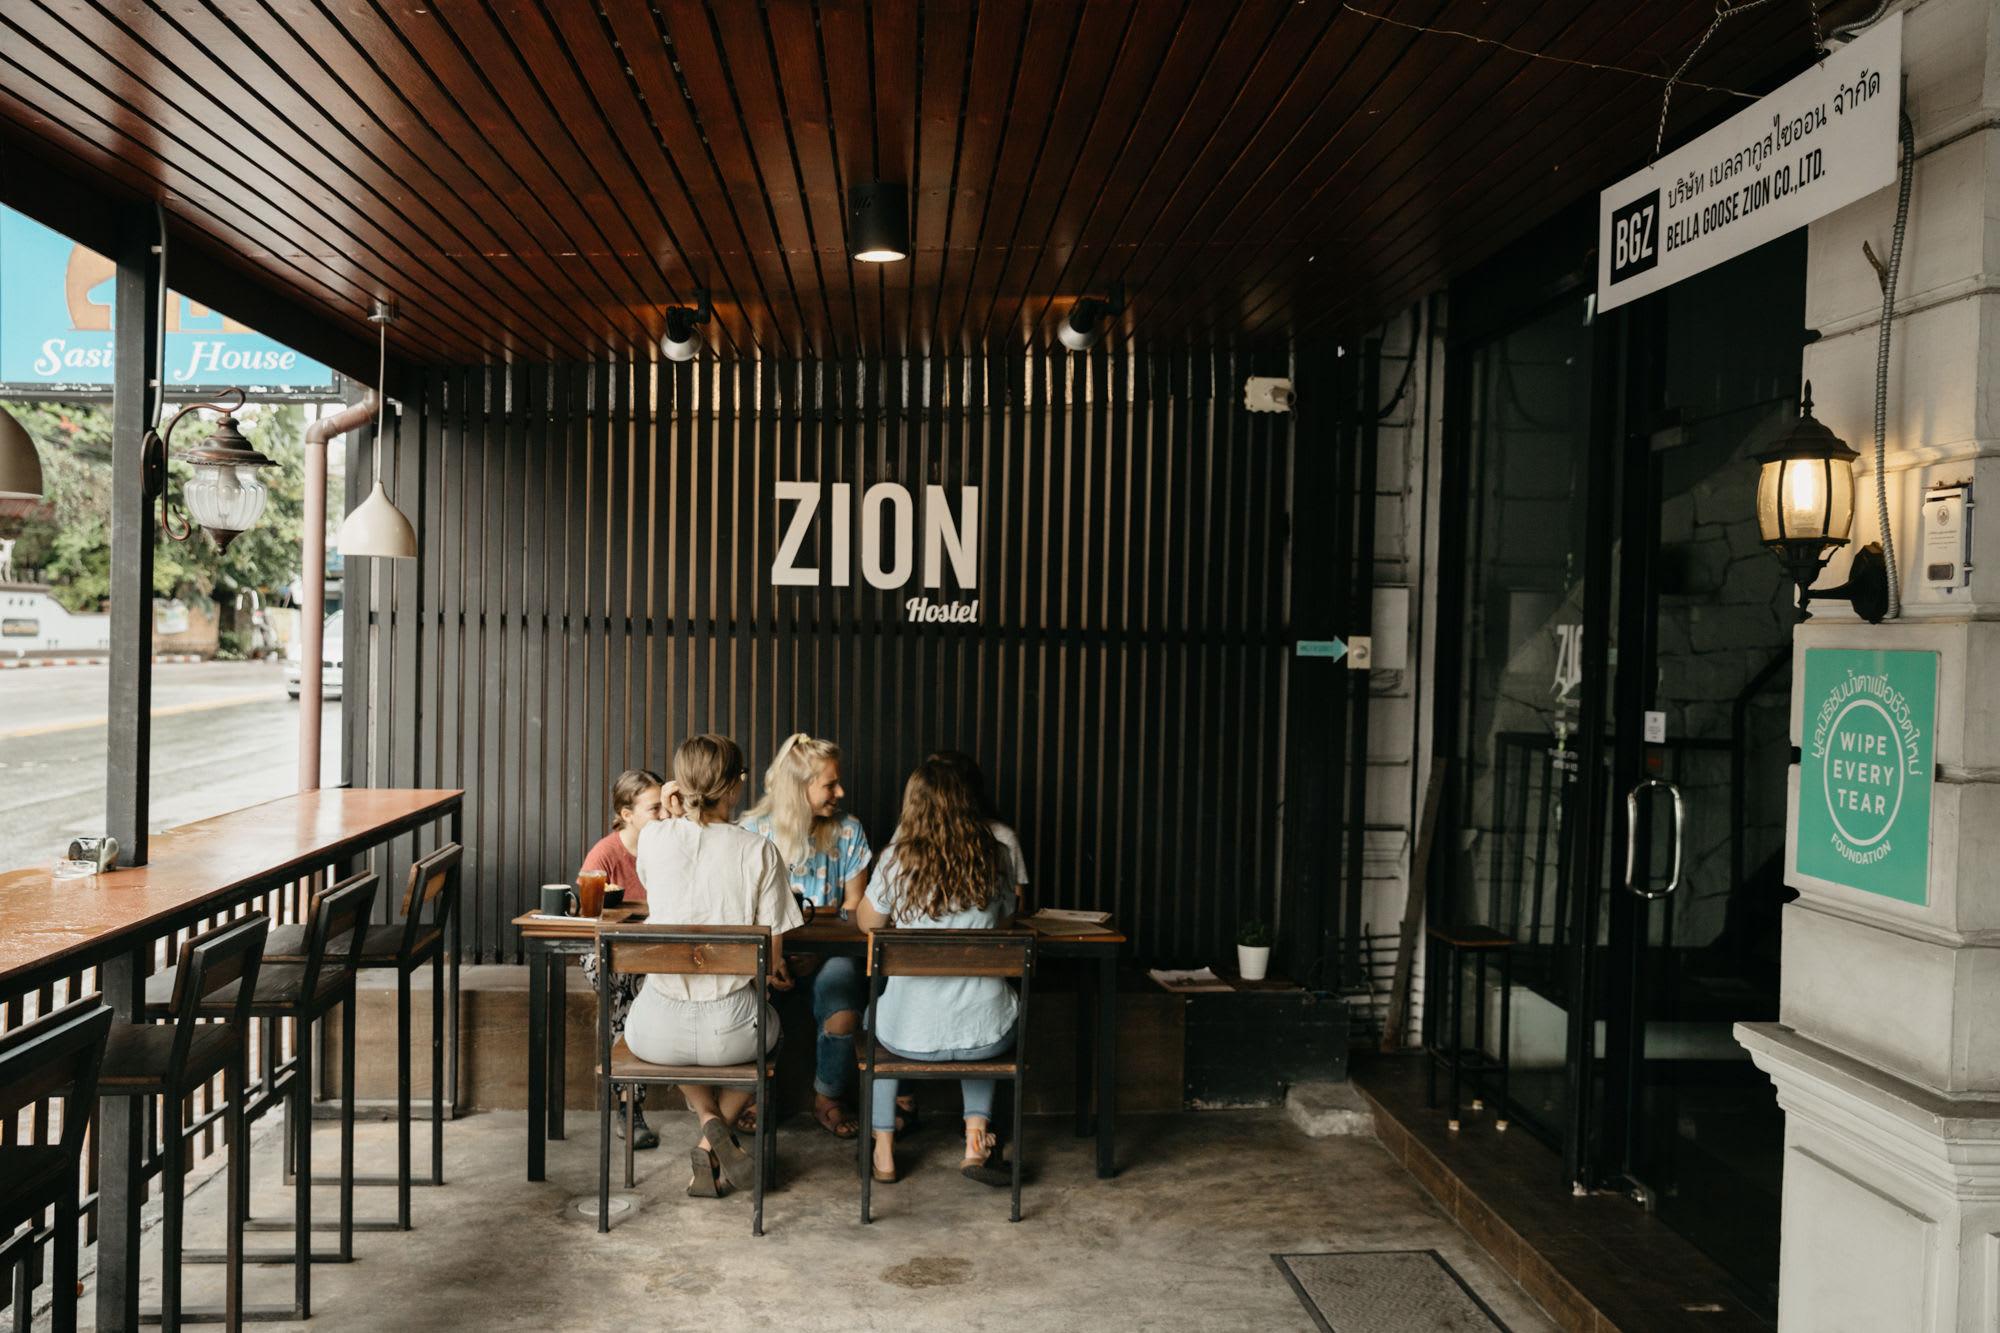 HOSTEL - Zion Hostel